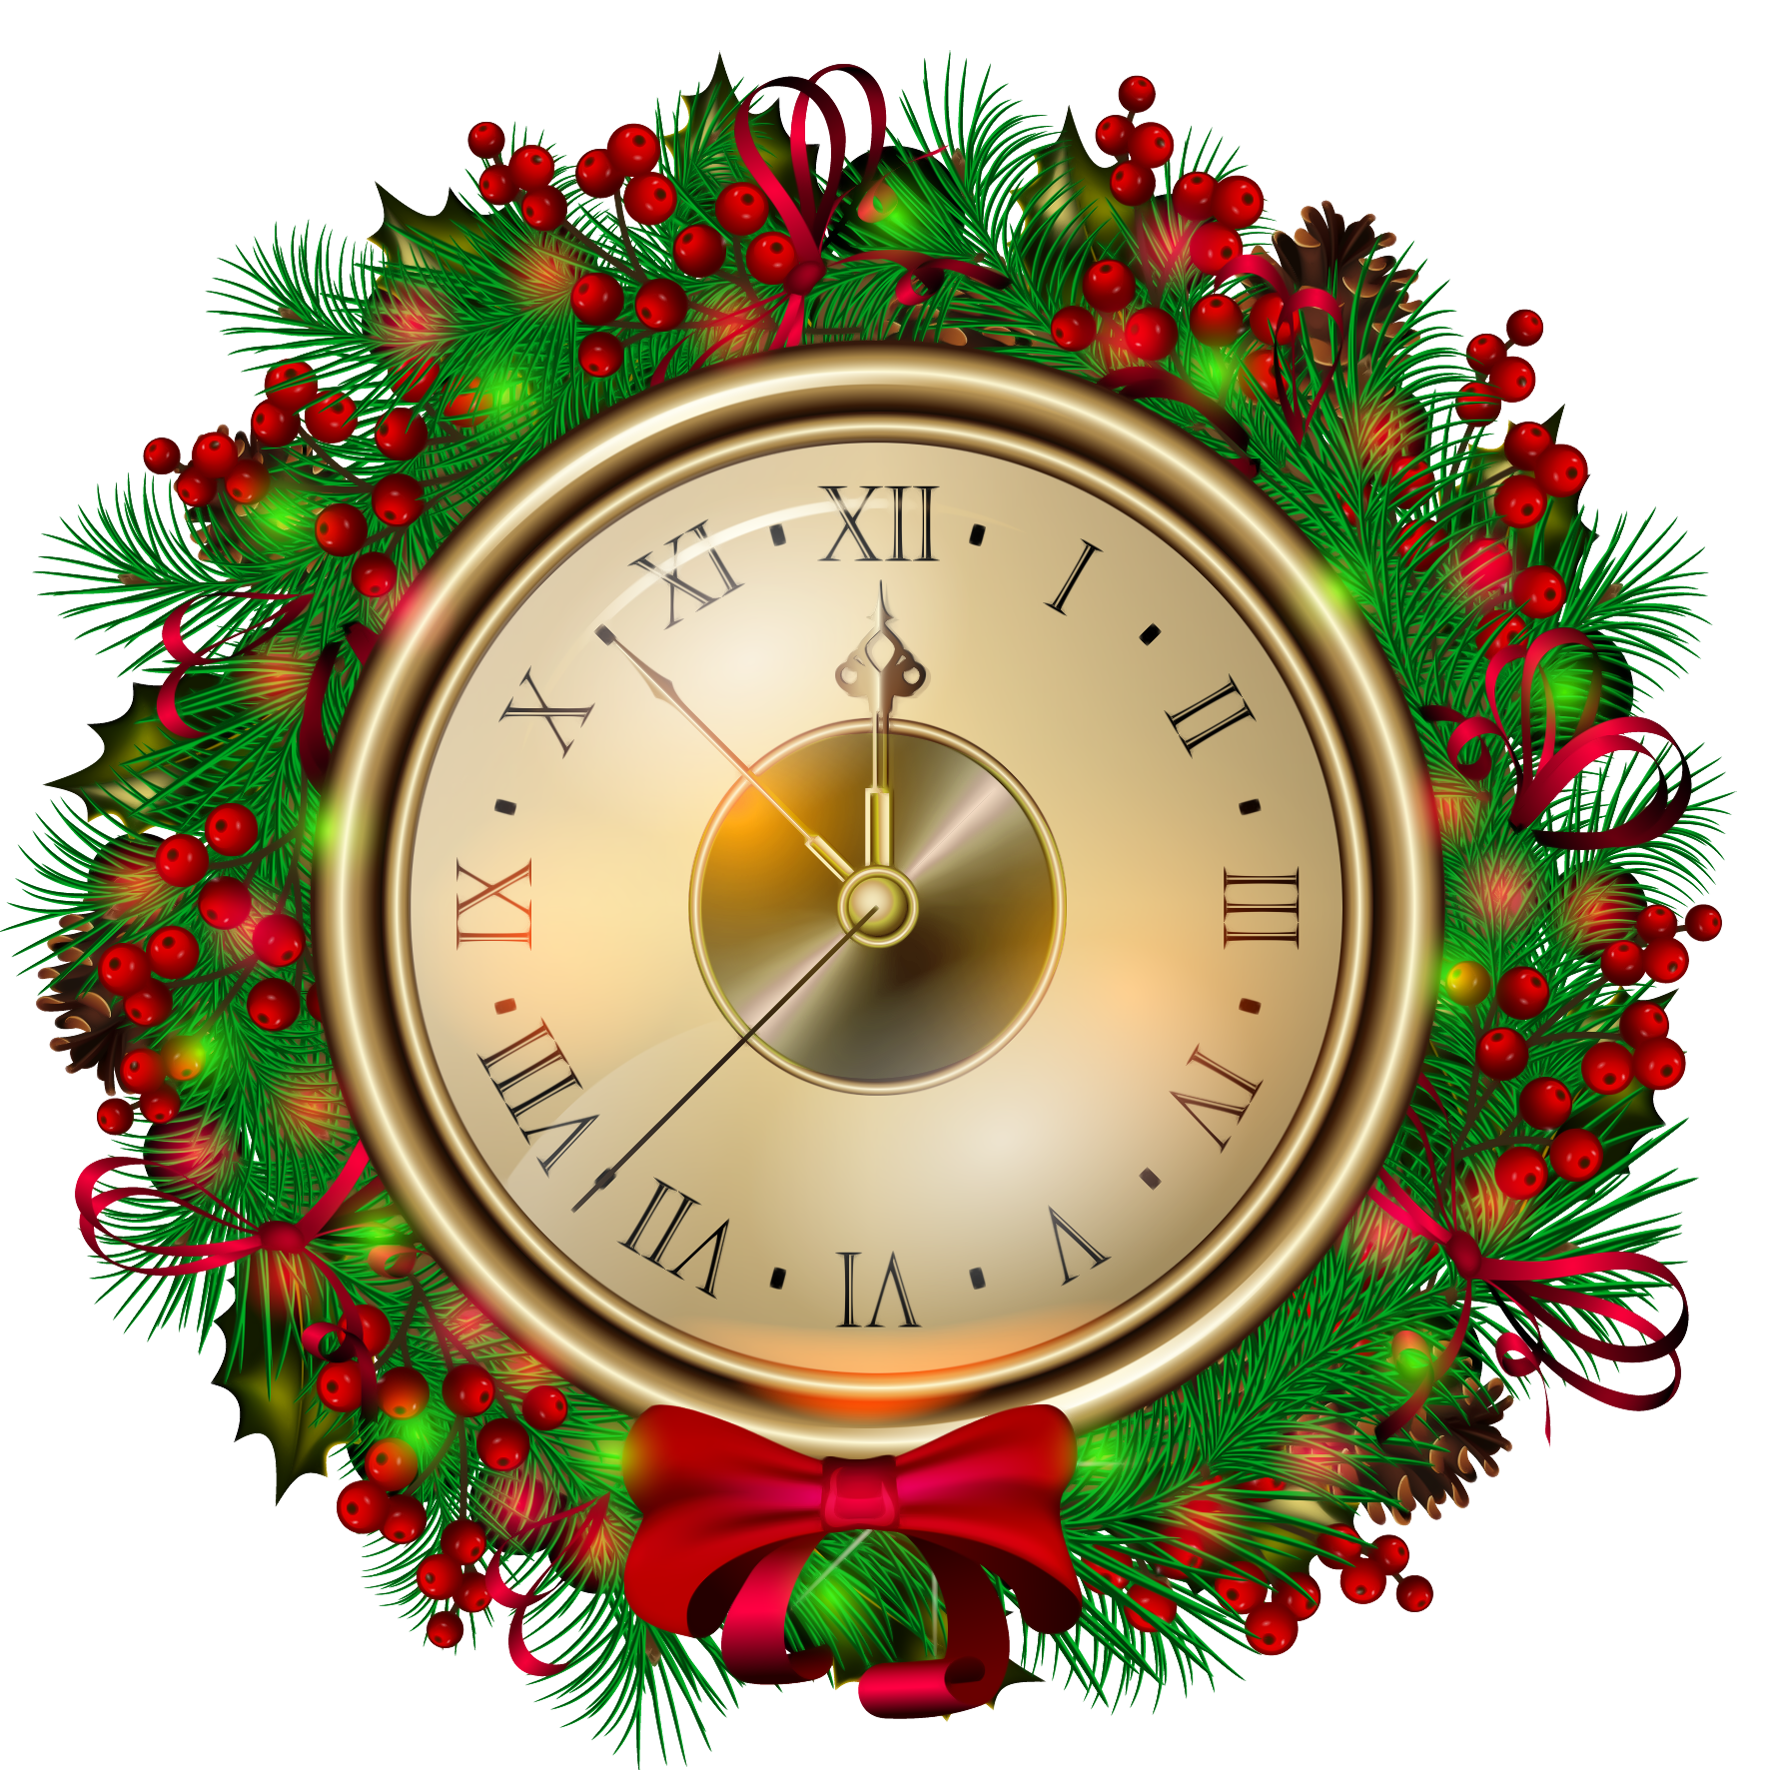 Free pumpkin clock clipart graphic royalty free stock Transparent Christmas Clock PNG Clipartt | Gallery Yopriceville ... graphic royalty free stock